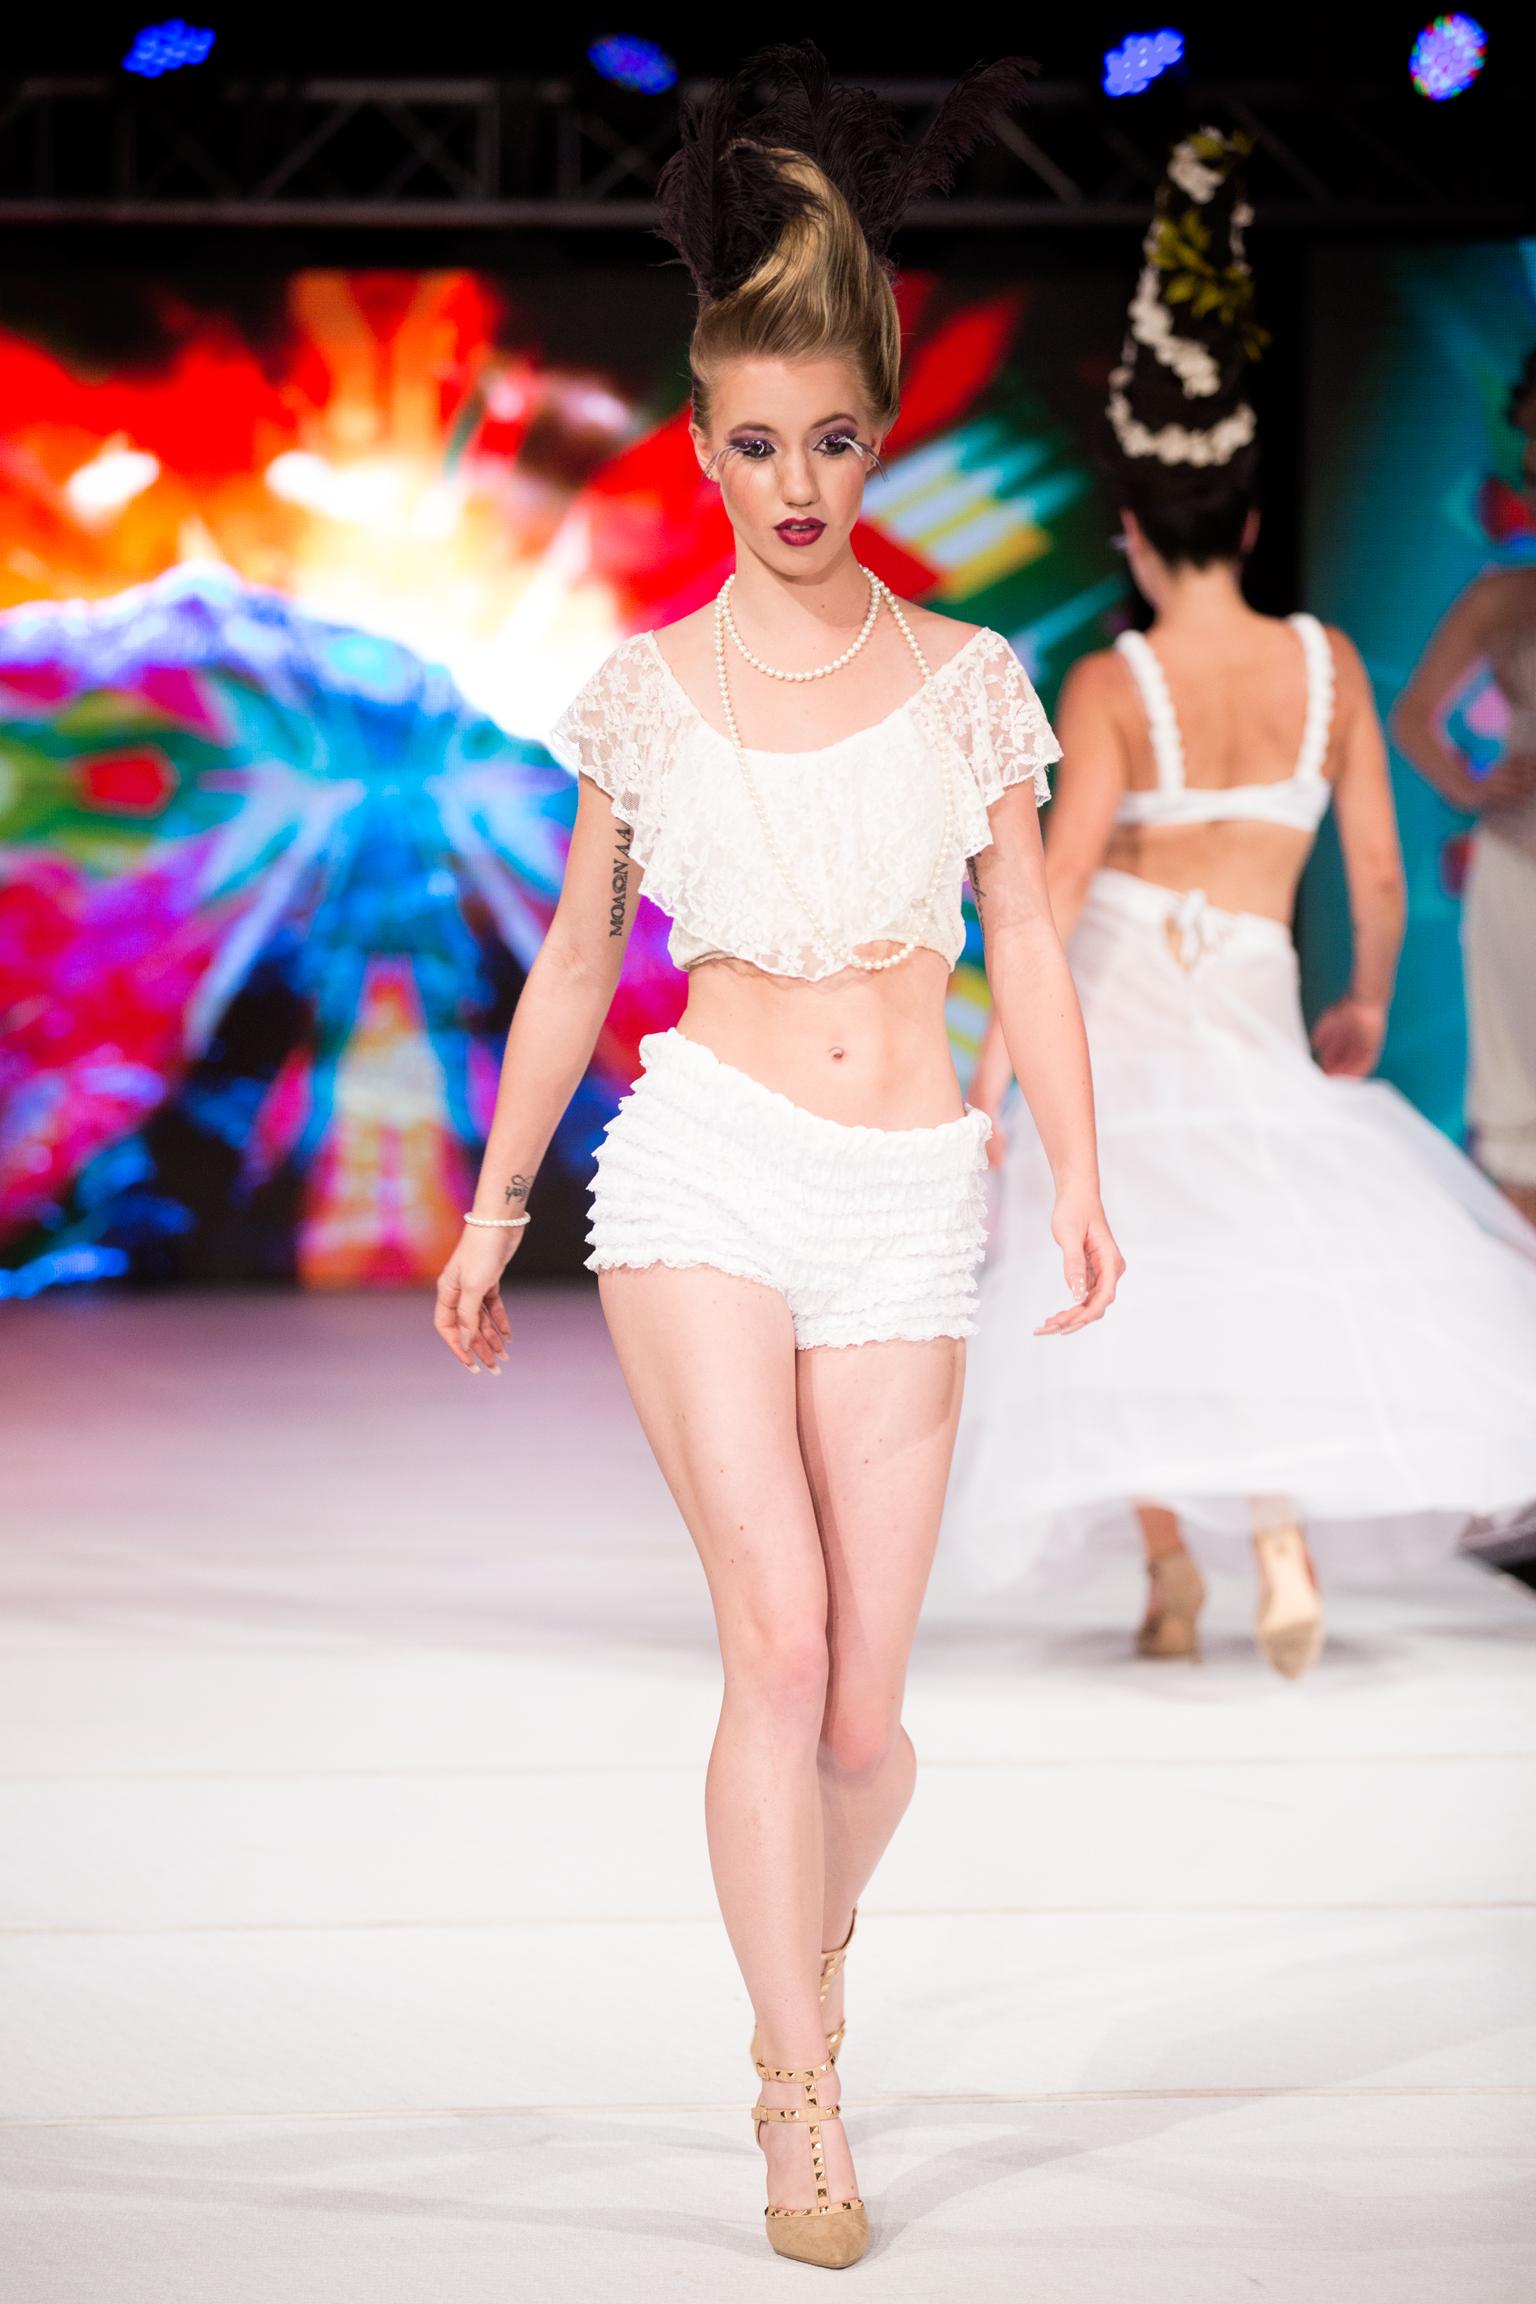 Denver-Fashion-Week-Day-4-_-Coco-Marie---007.jpg